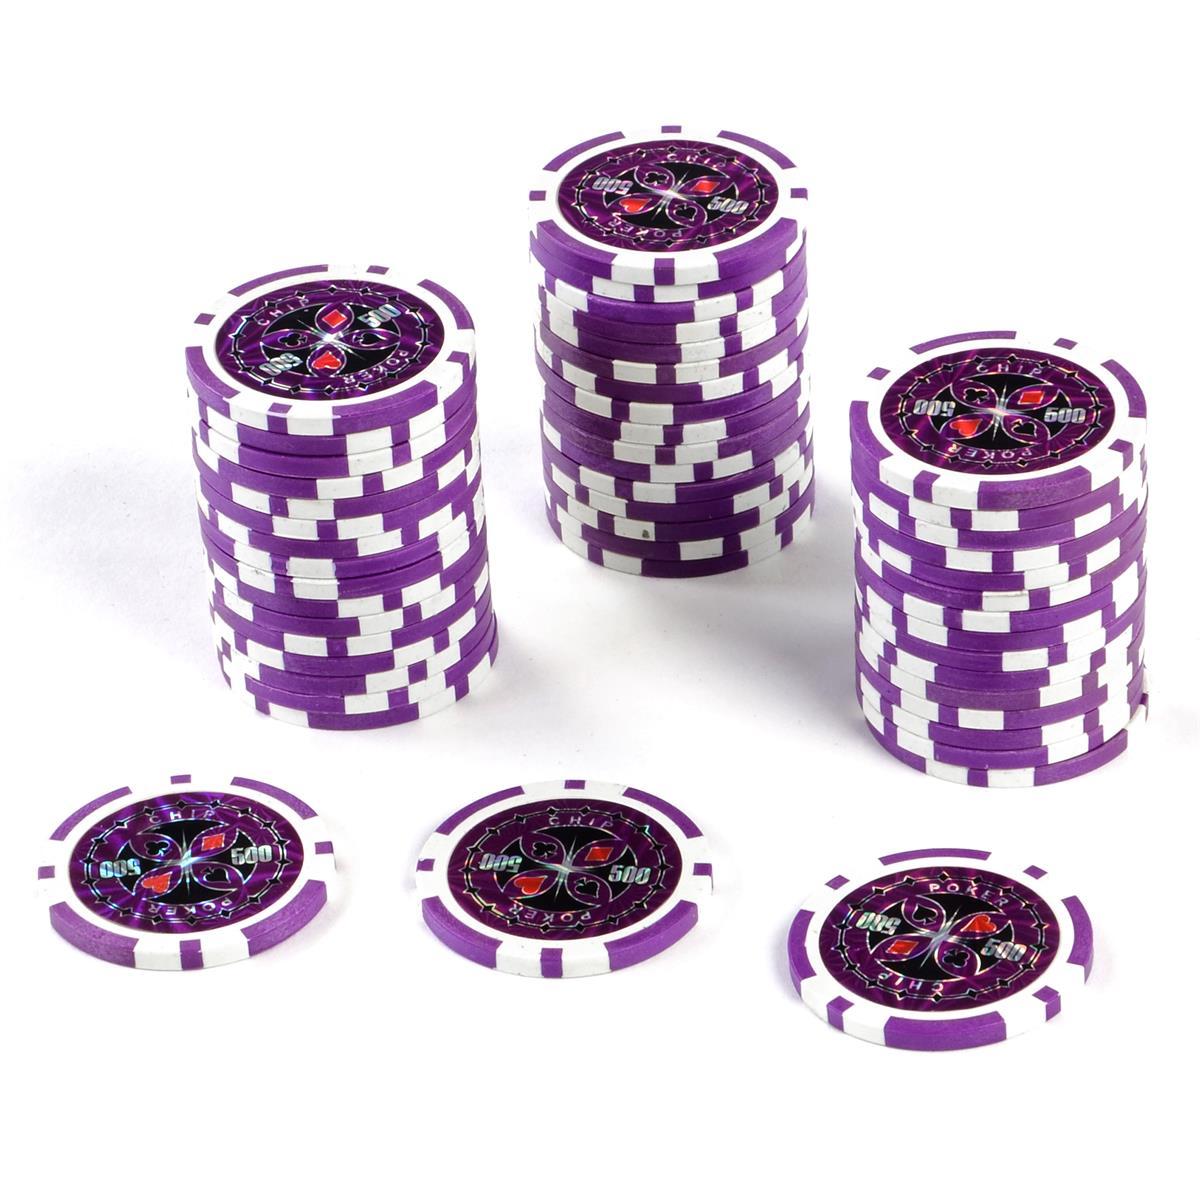 50 Poker-Chips Wert 500 Laserchip 12g Metallkern ergänzend zum Pokerkoffer